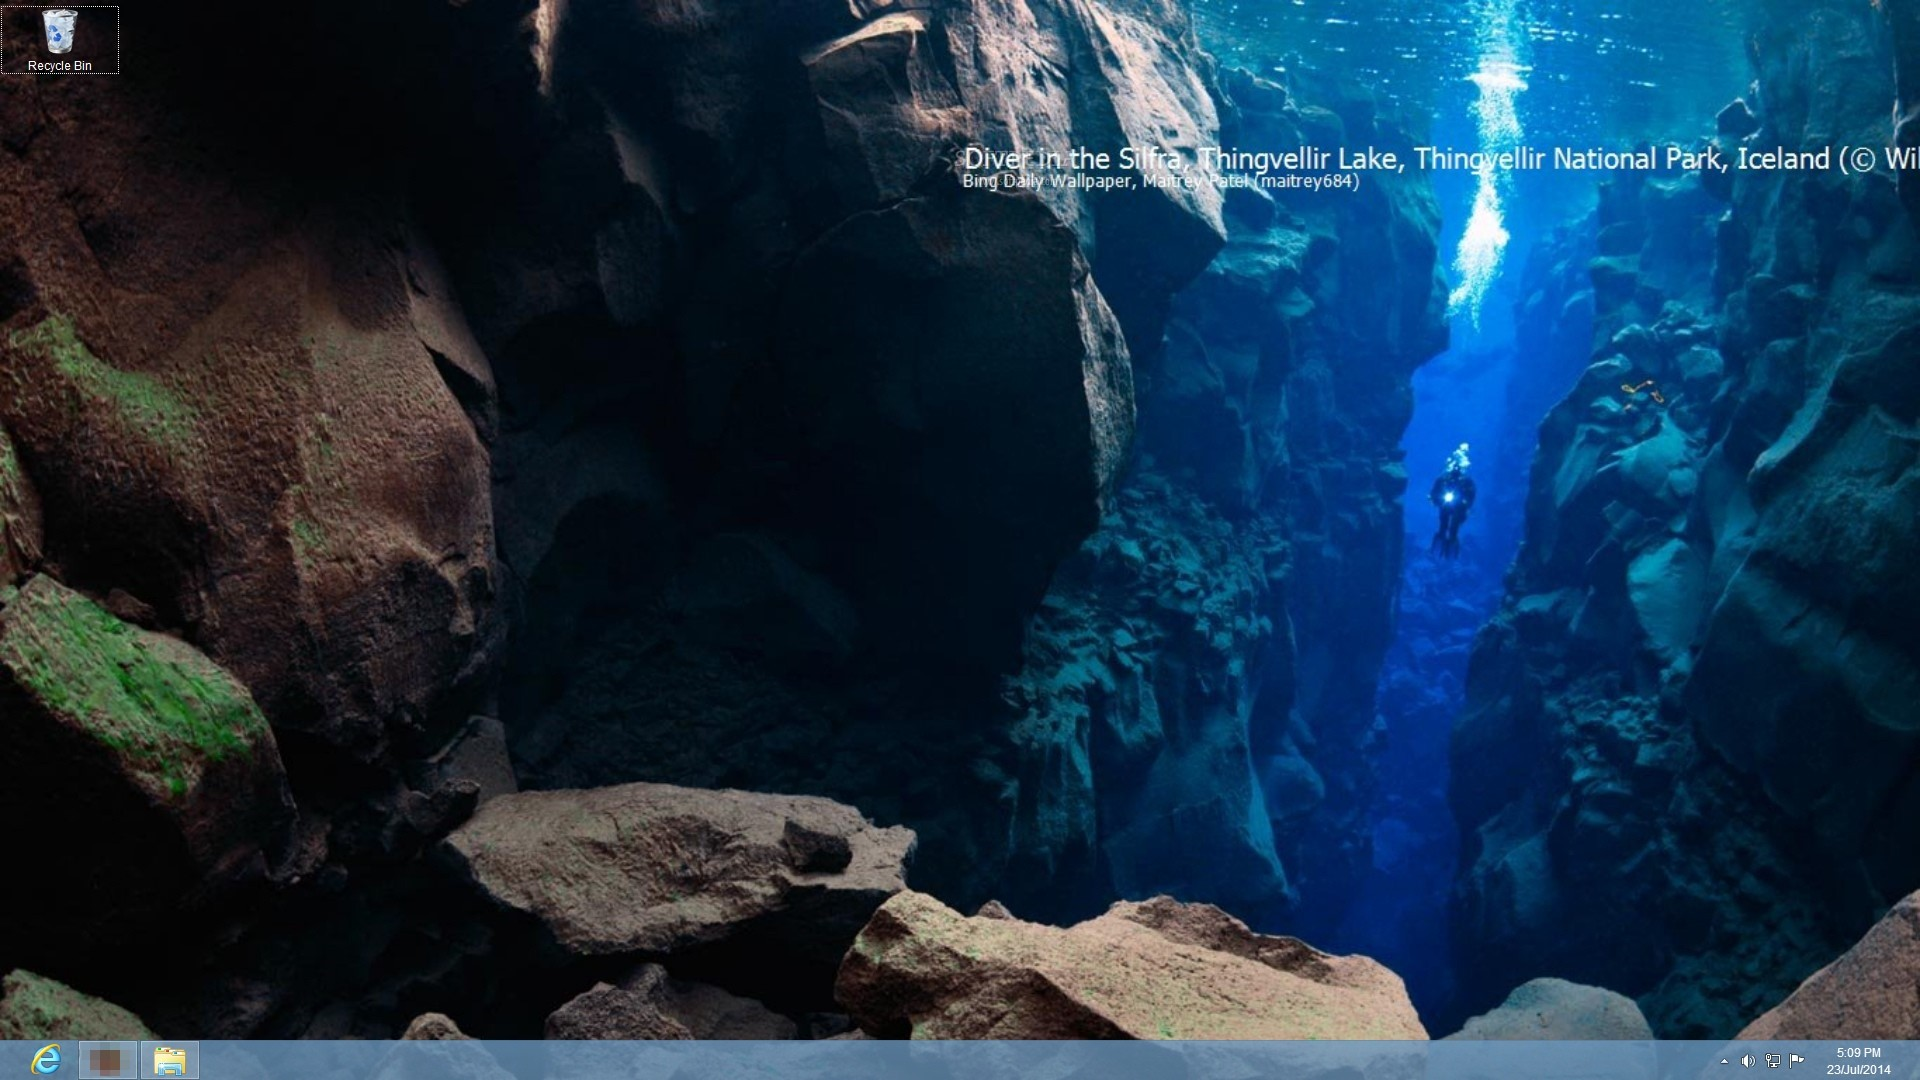 Bing-Daily-Wallpaper_1.jpg